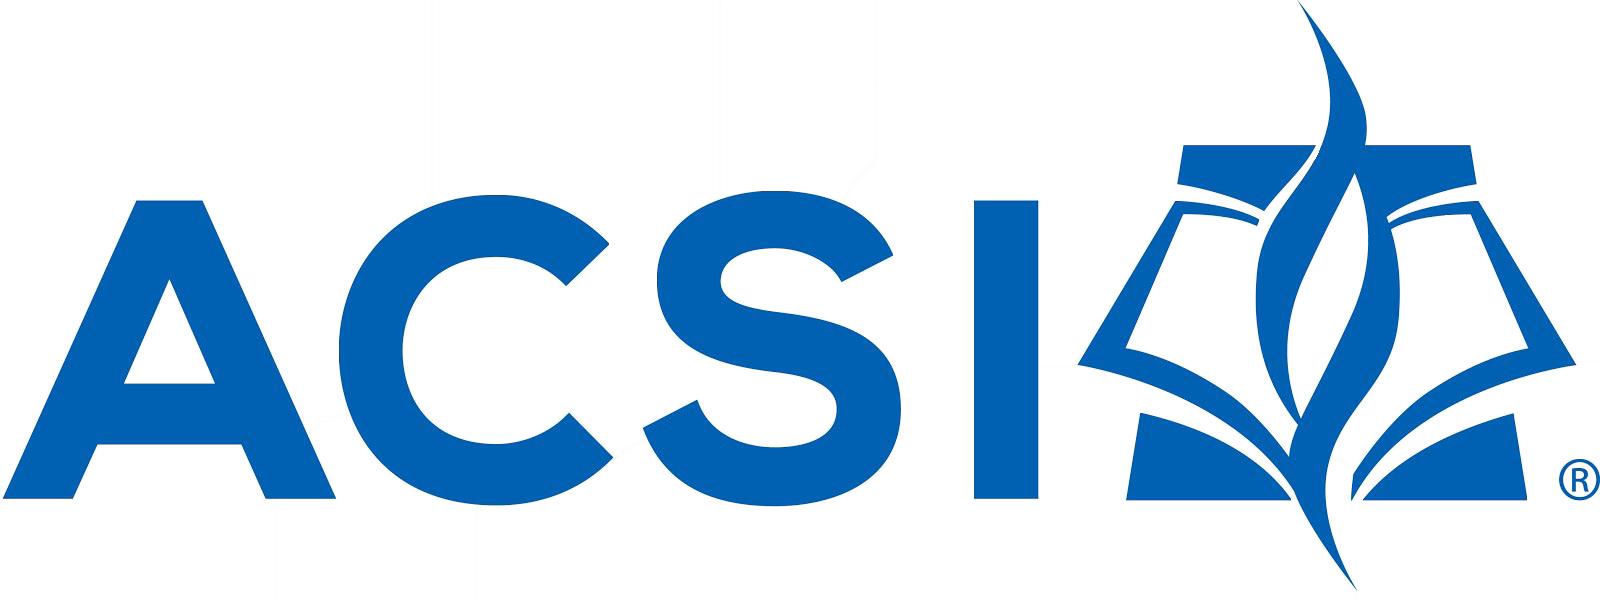 Association of Christian Schools International logo